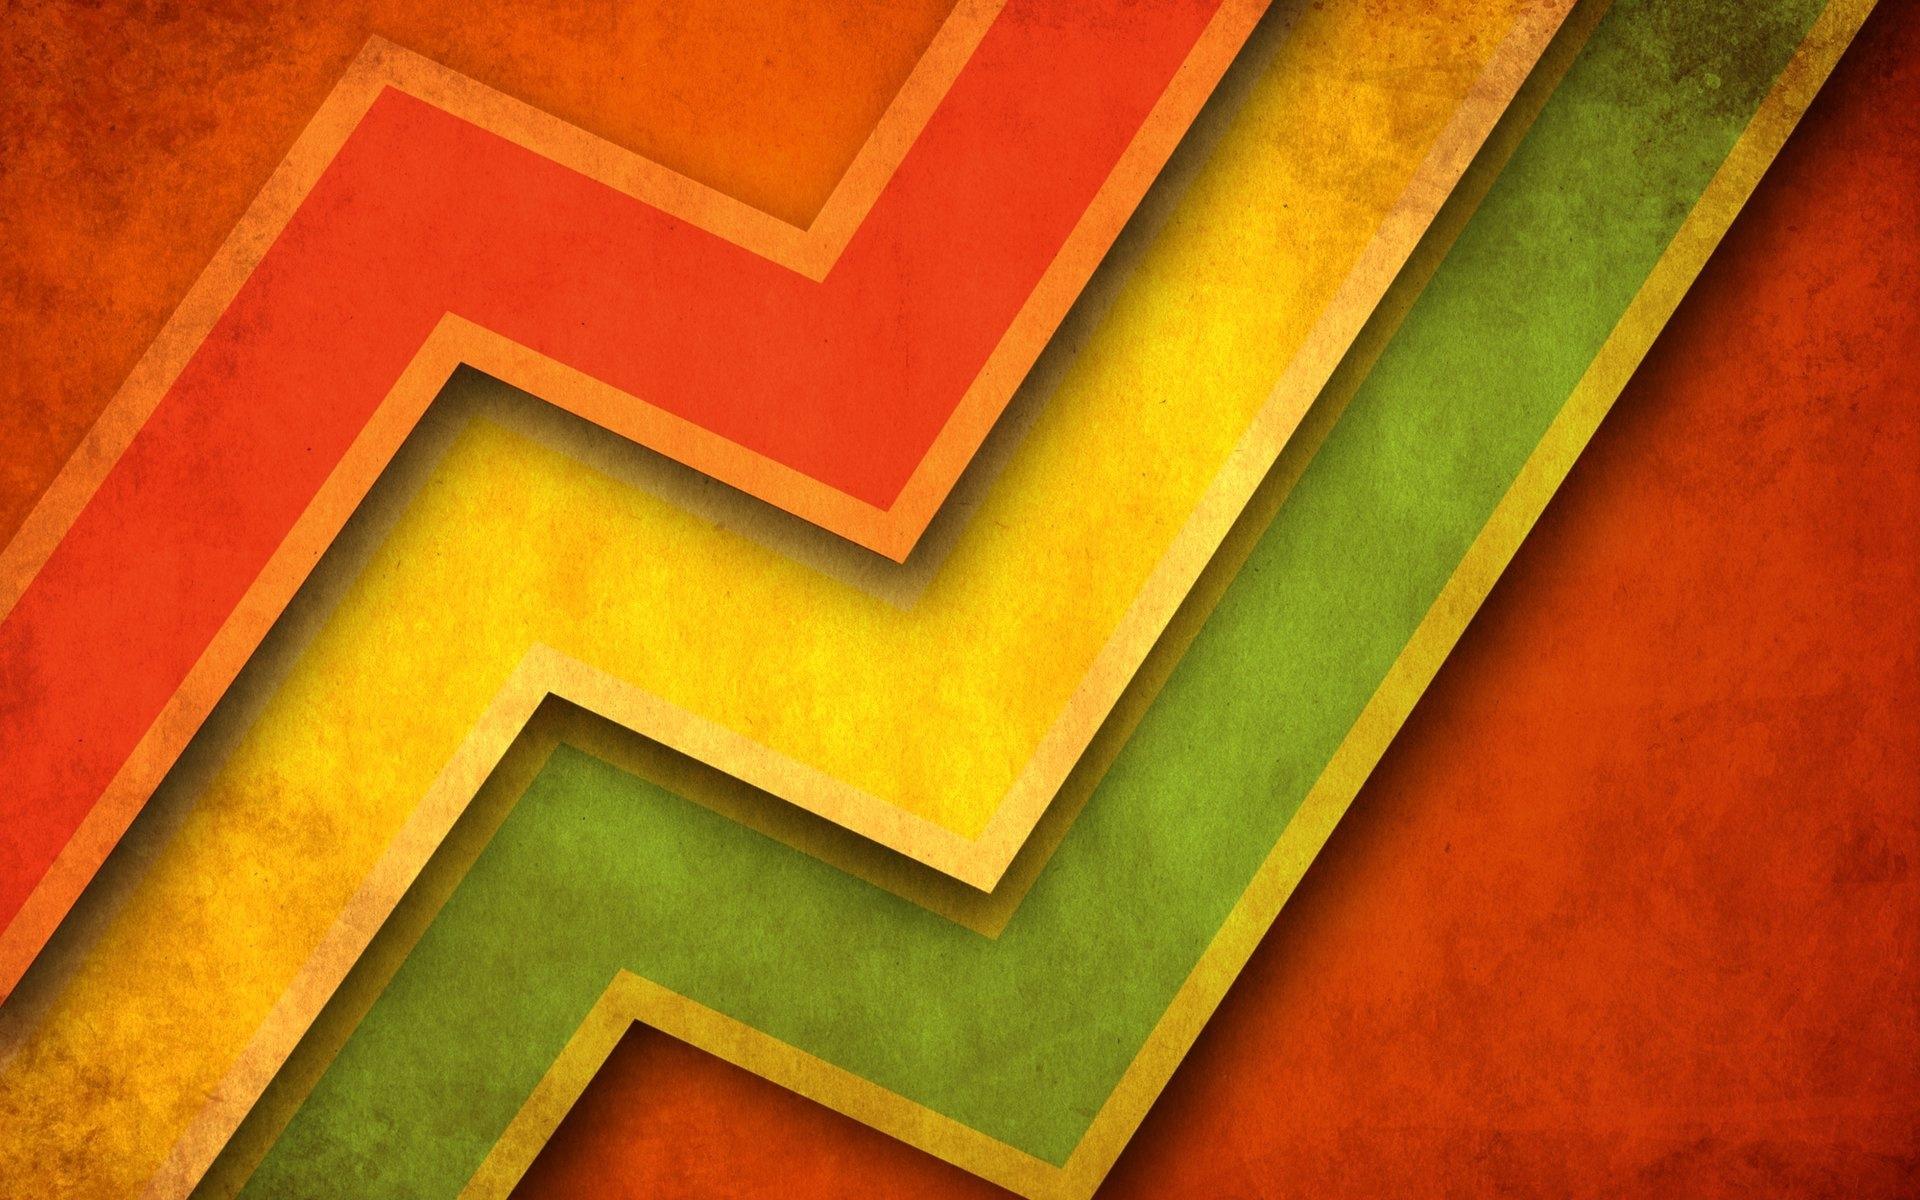 Line Color Form : Wallpaper : red symmetry green yellow pattern grunge orange